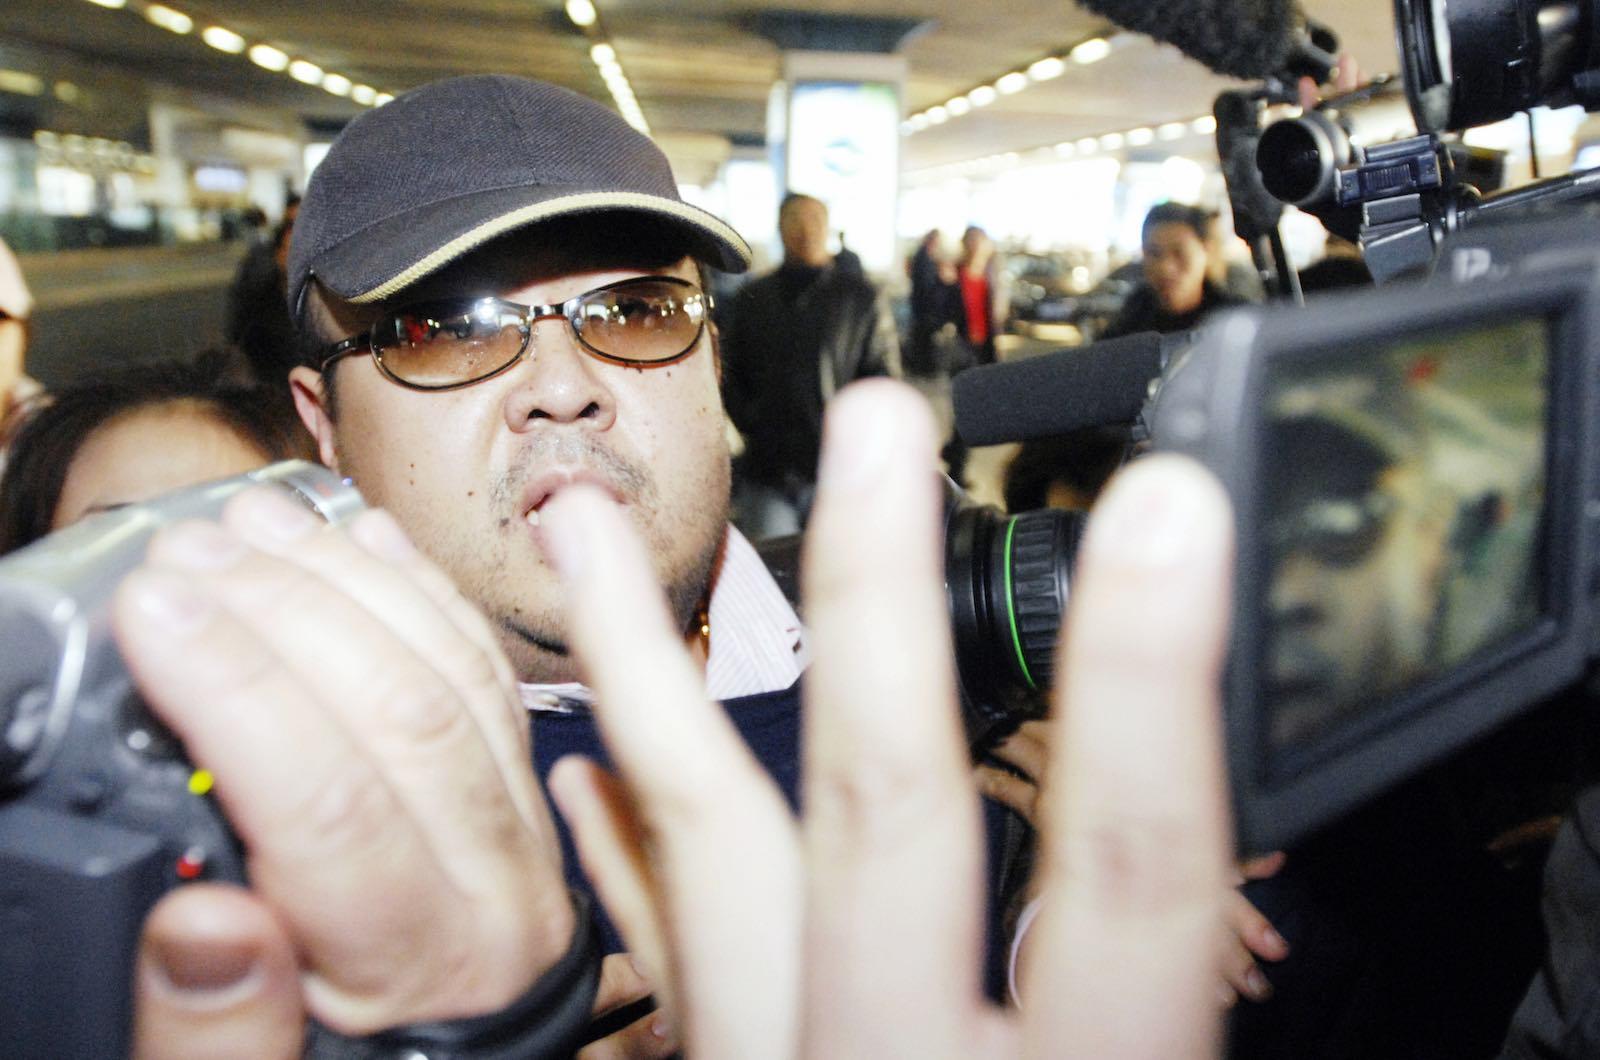 Will the hunt for the apparent masterminds behind Kim Jong-nam's killing continue? (Photo: The Asahi Shimbun via Getty)